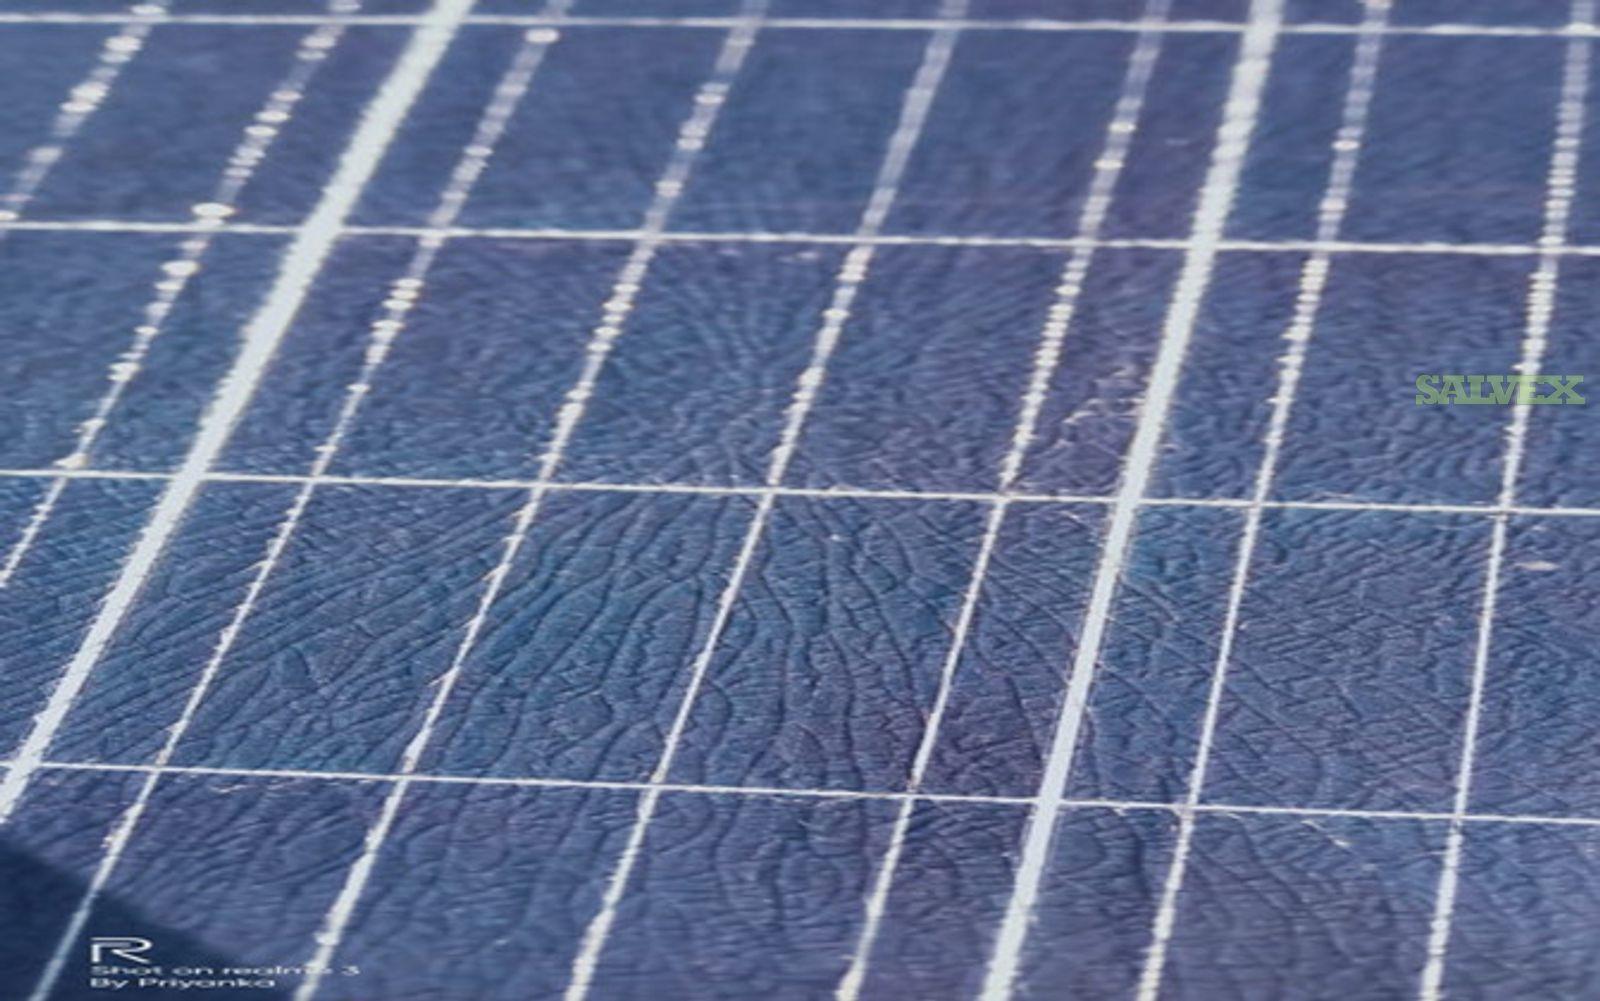 AstroEnergy 320W & JA Solar 320-330W Canadian Solar Modules - Damaged (722 Modules)